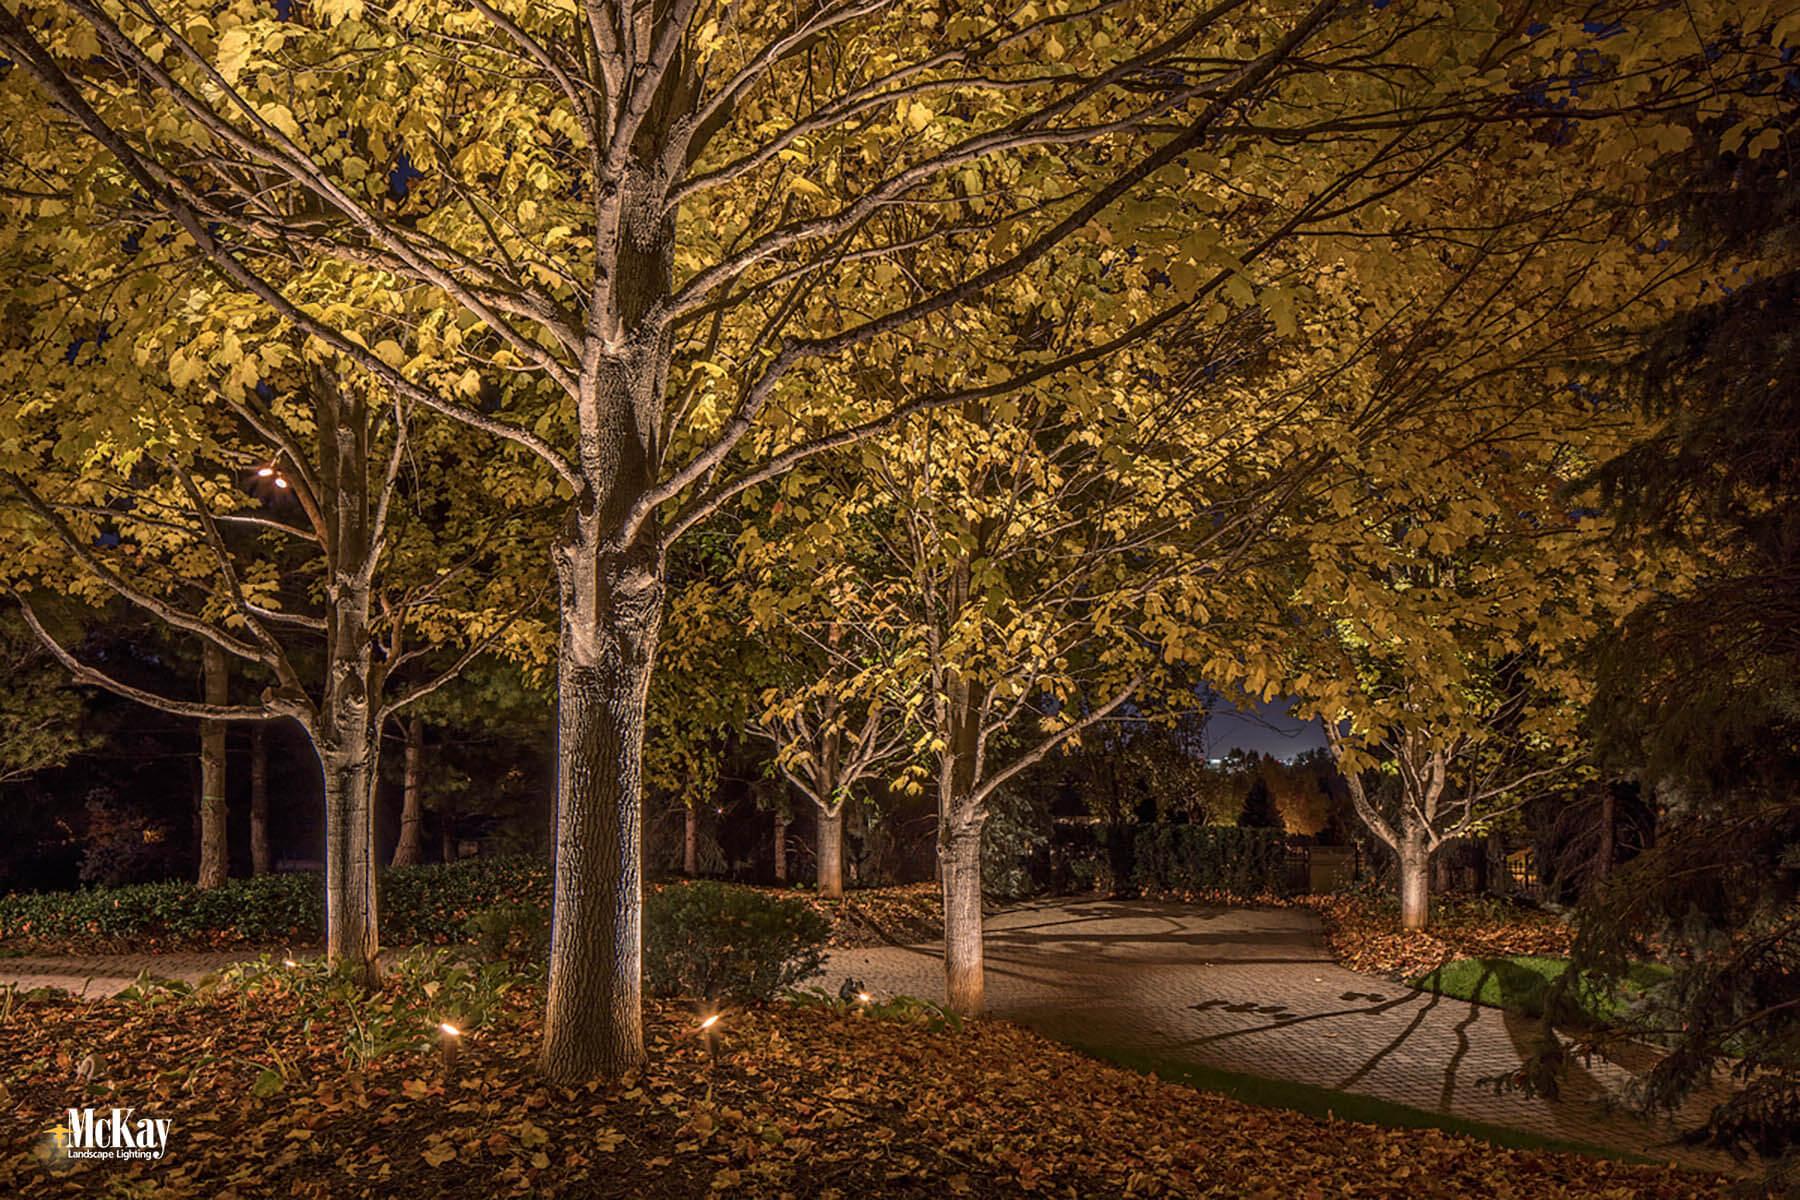 See more photos of the outdoor lighting design at this elegant estate in Omaha, Nebraska | McKay Landscape Lighting